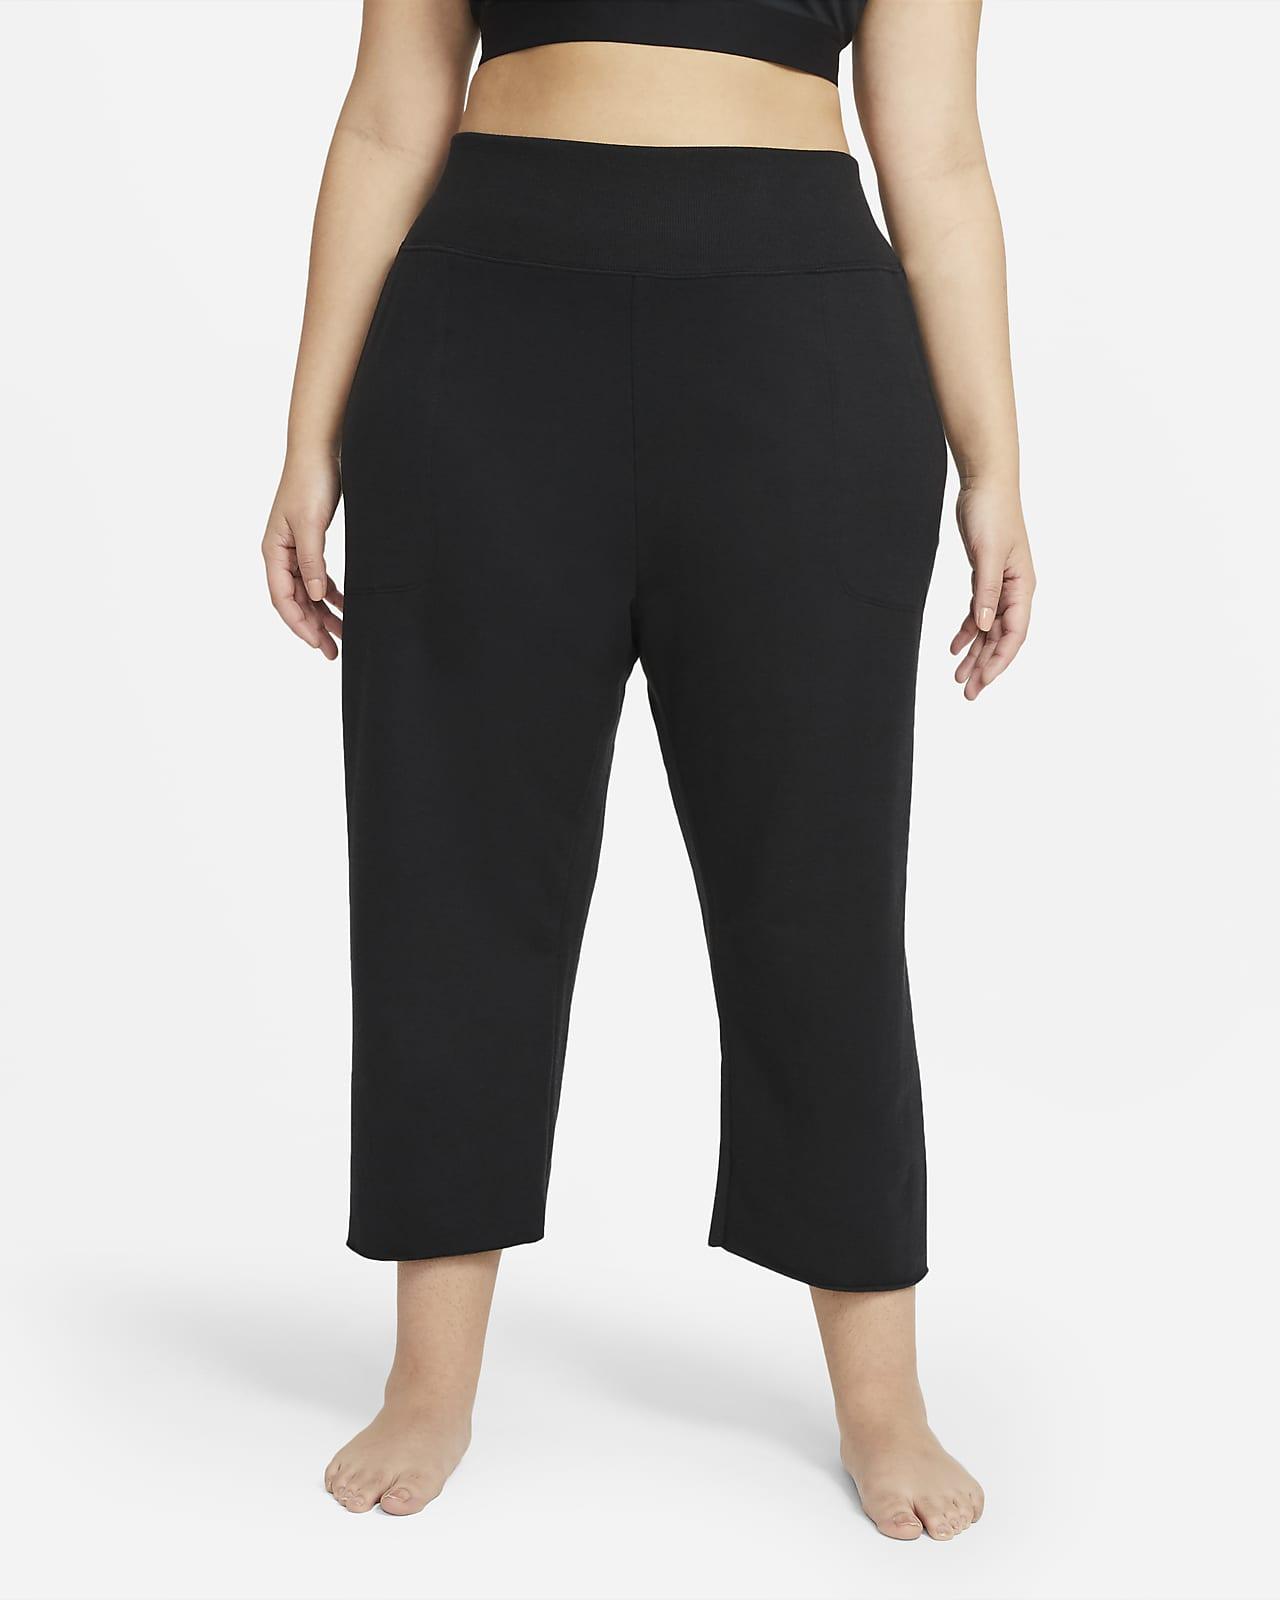 Nike Yoga Luxe Women's Cropped Fleece Pants (Plus Size)